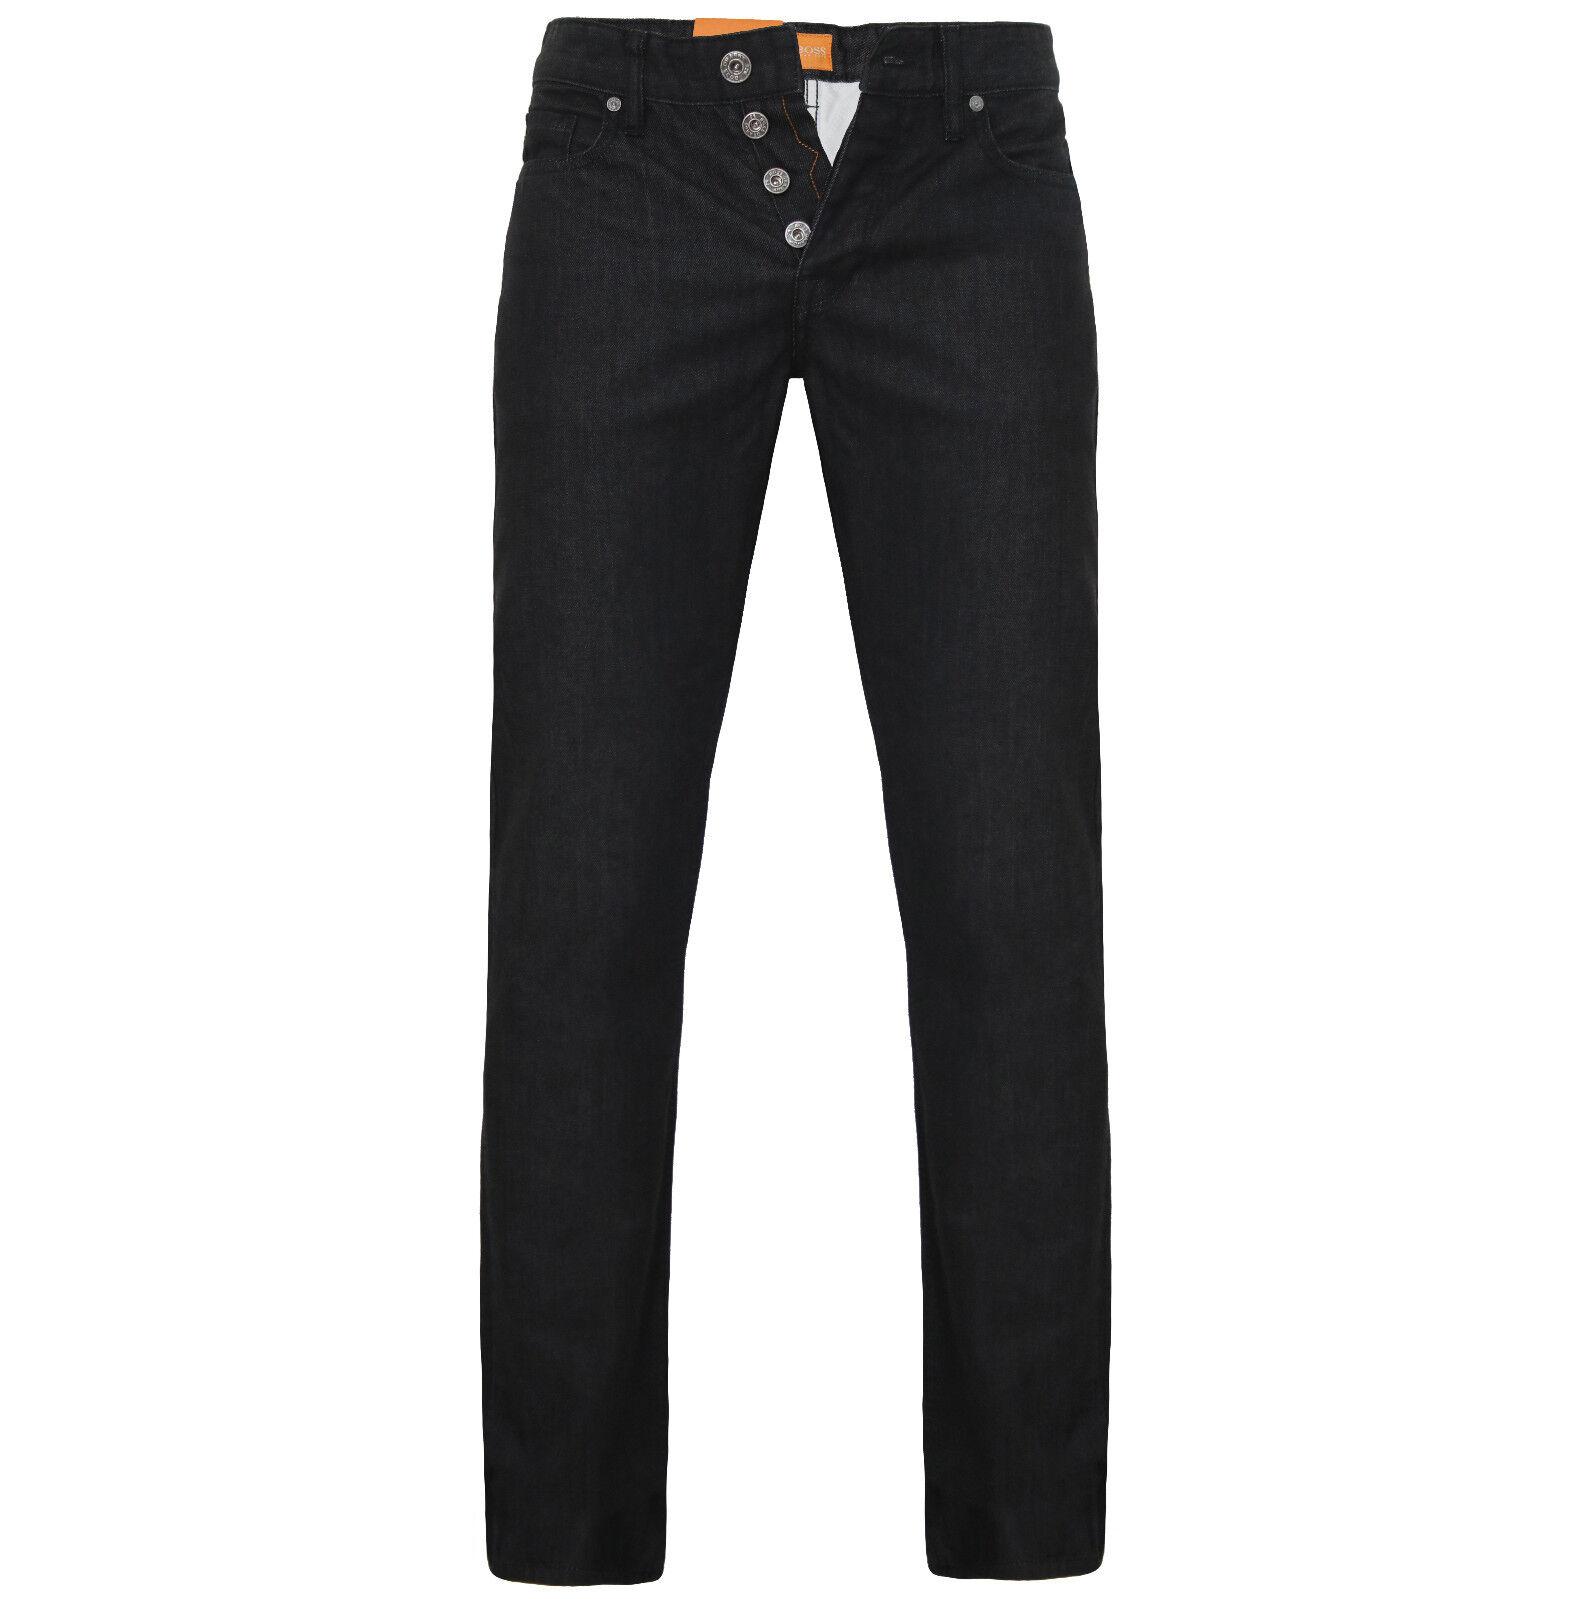 BOSS Orange  Hose Jeans Orange 25 schwarz rigit  W38 L36 NEU REGULAR FIT